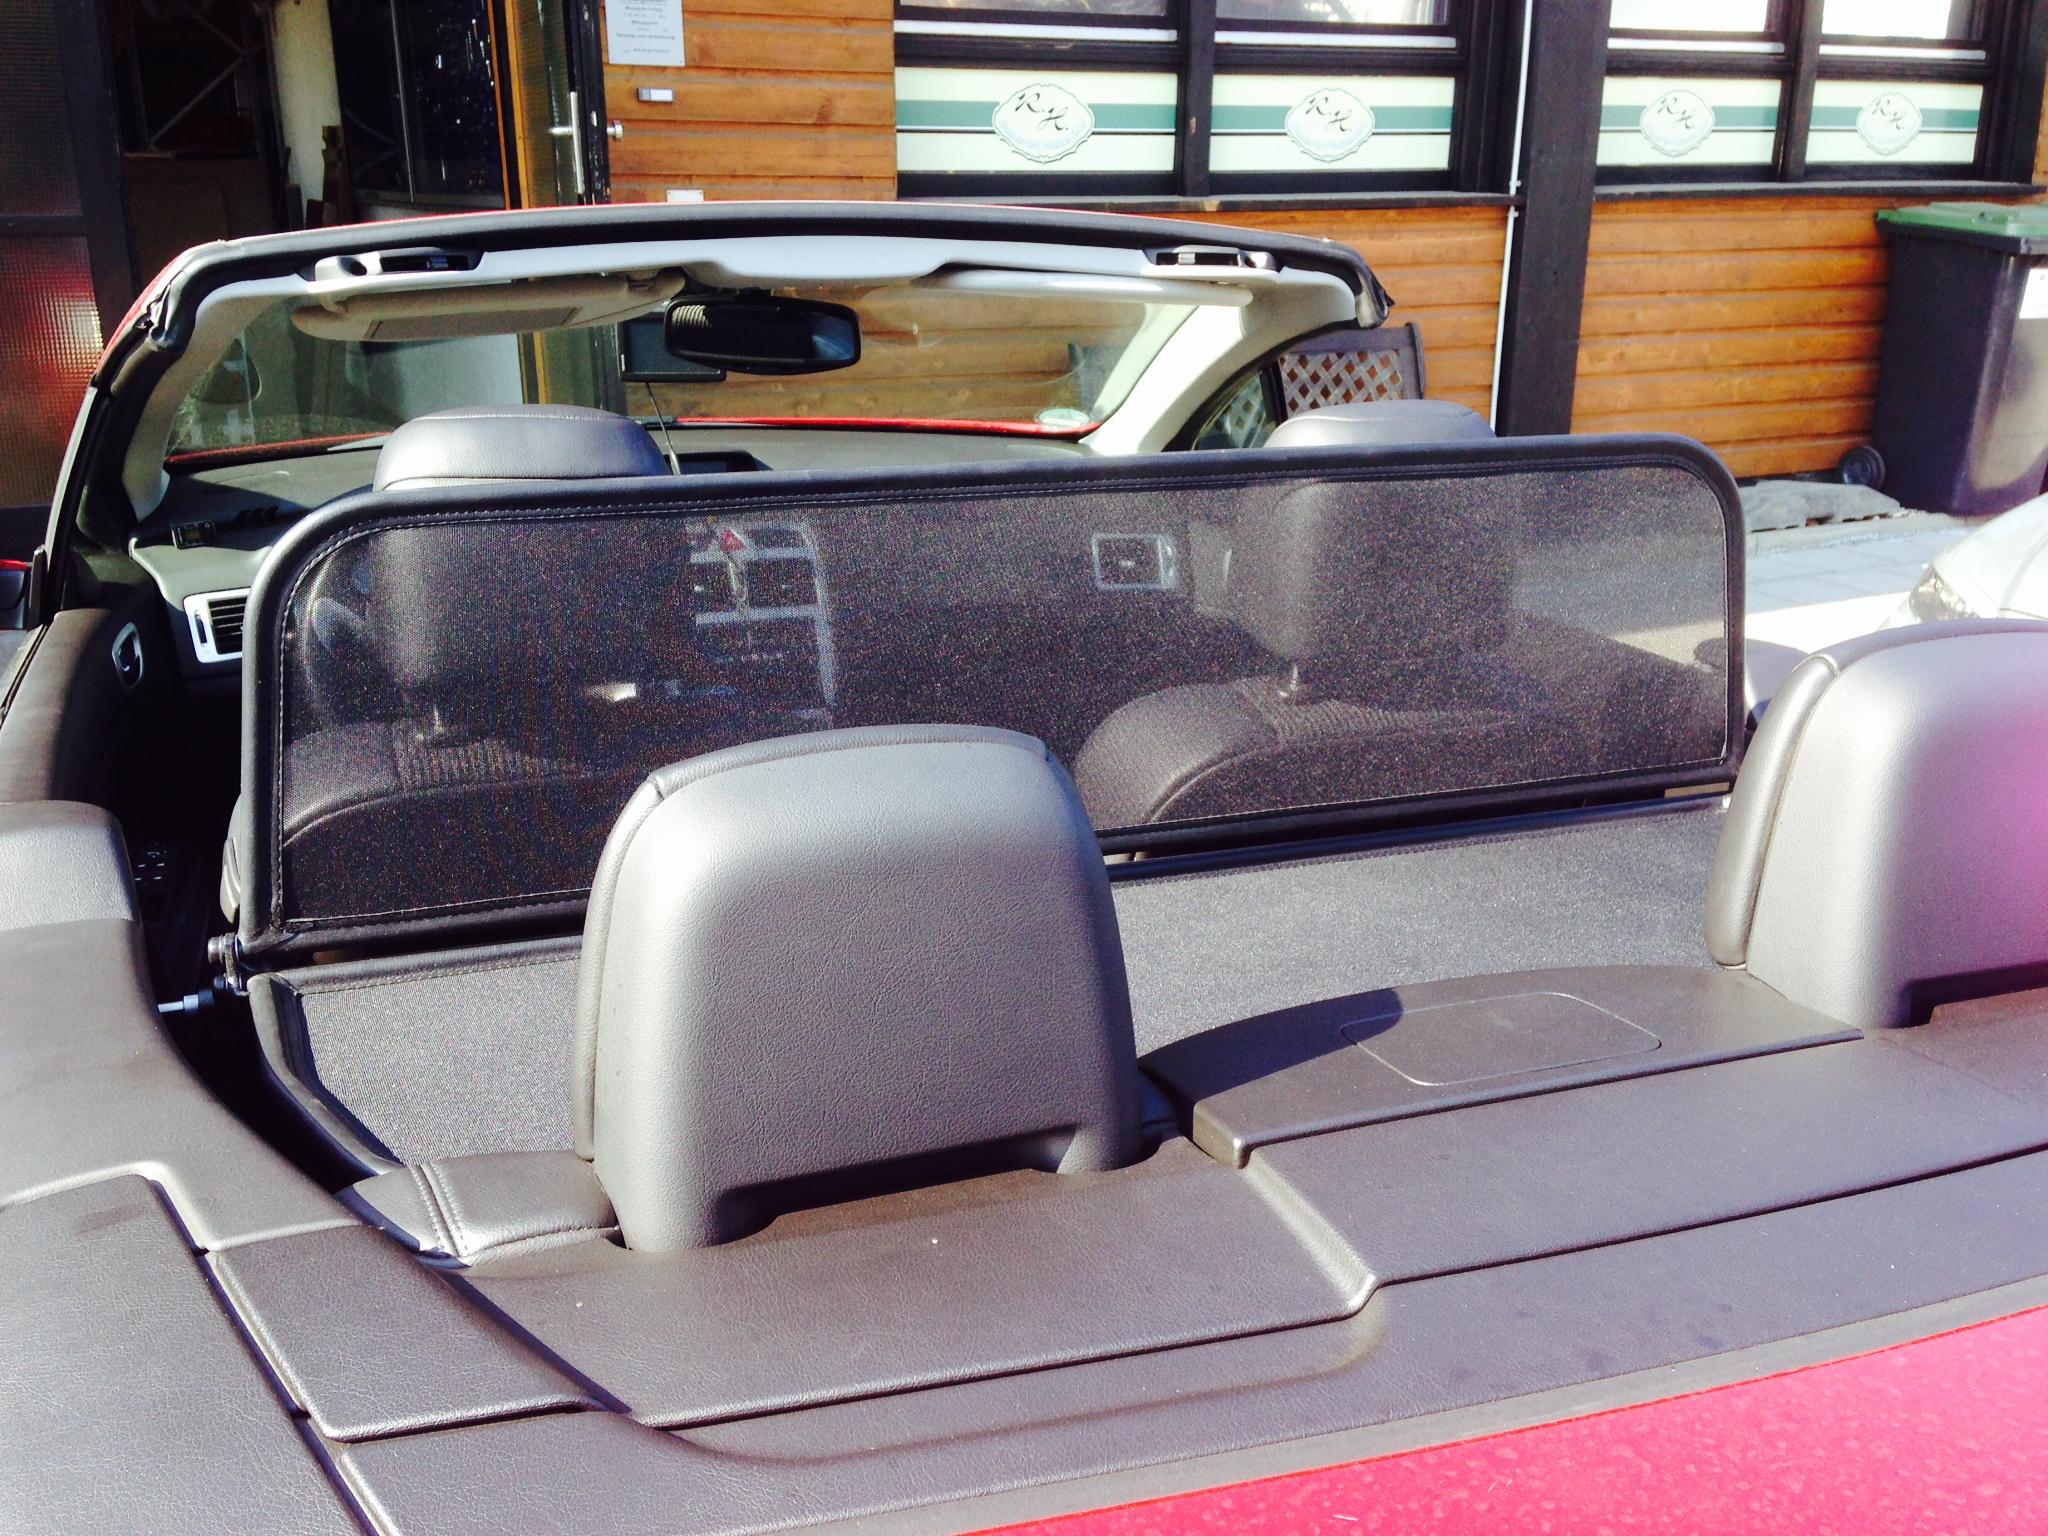 airax windschott tasche peugeot 307 cc schwarz mit. Black Bedroom Furniture Sets. Home Design Ideas